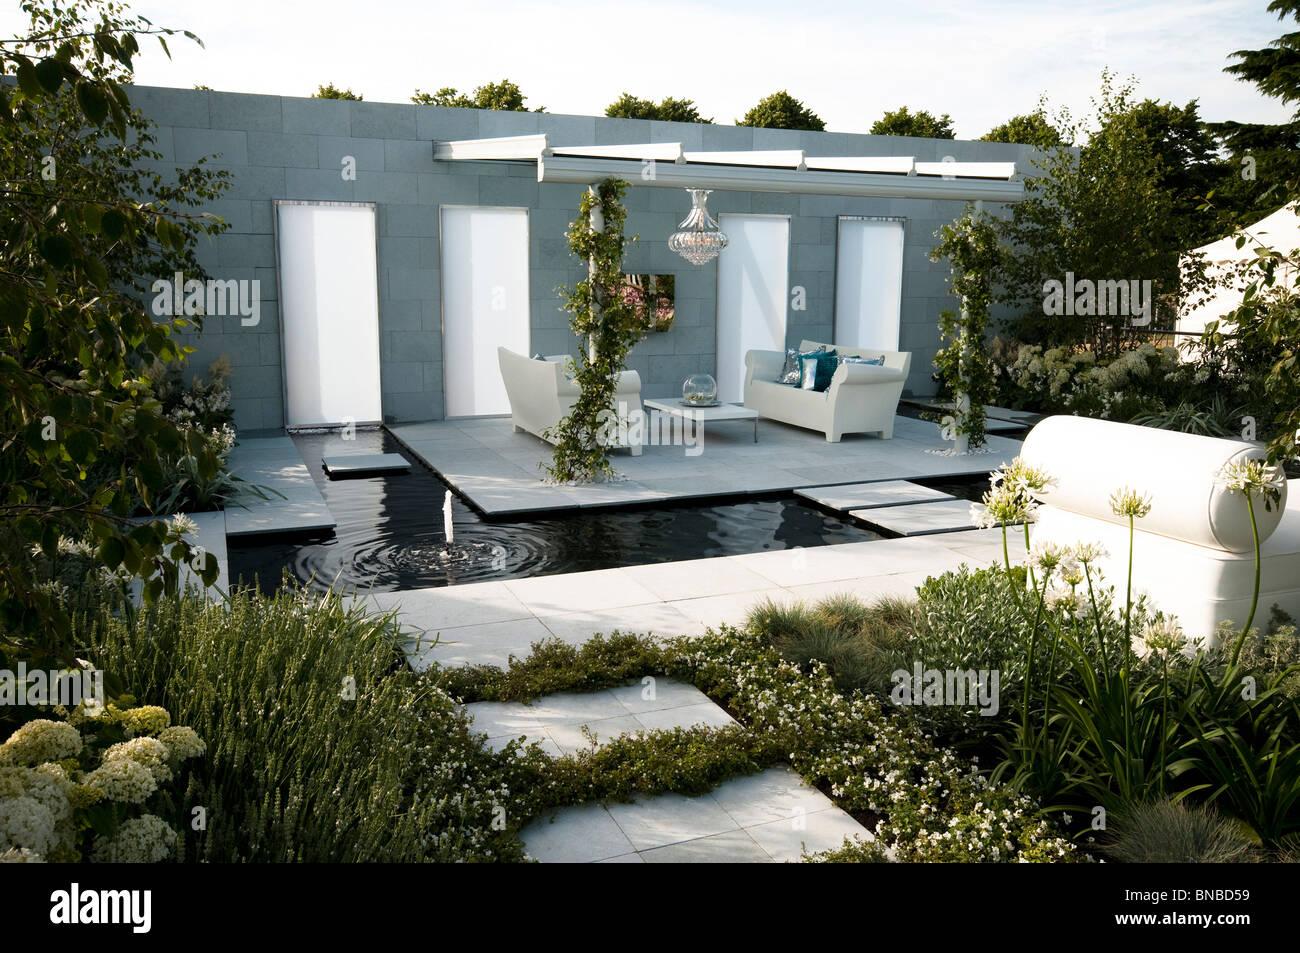 New Hampton Garden Apartments